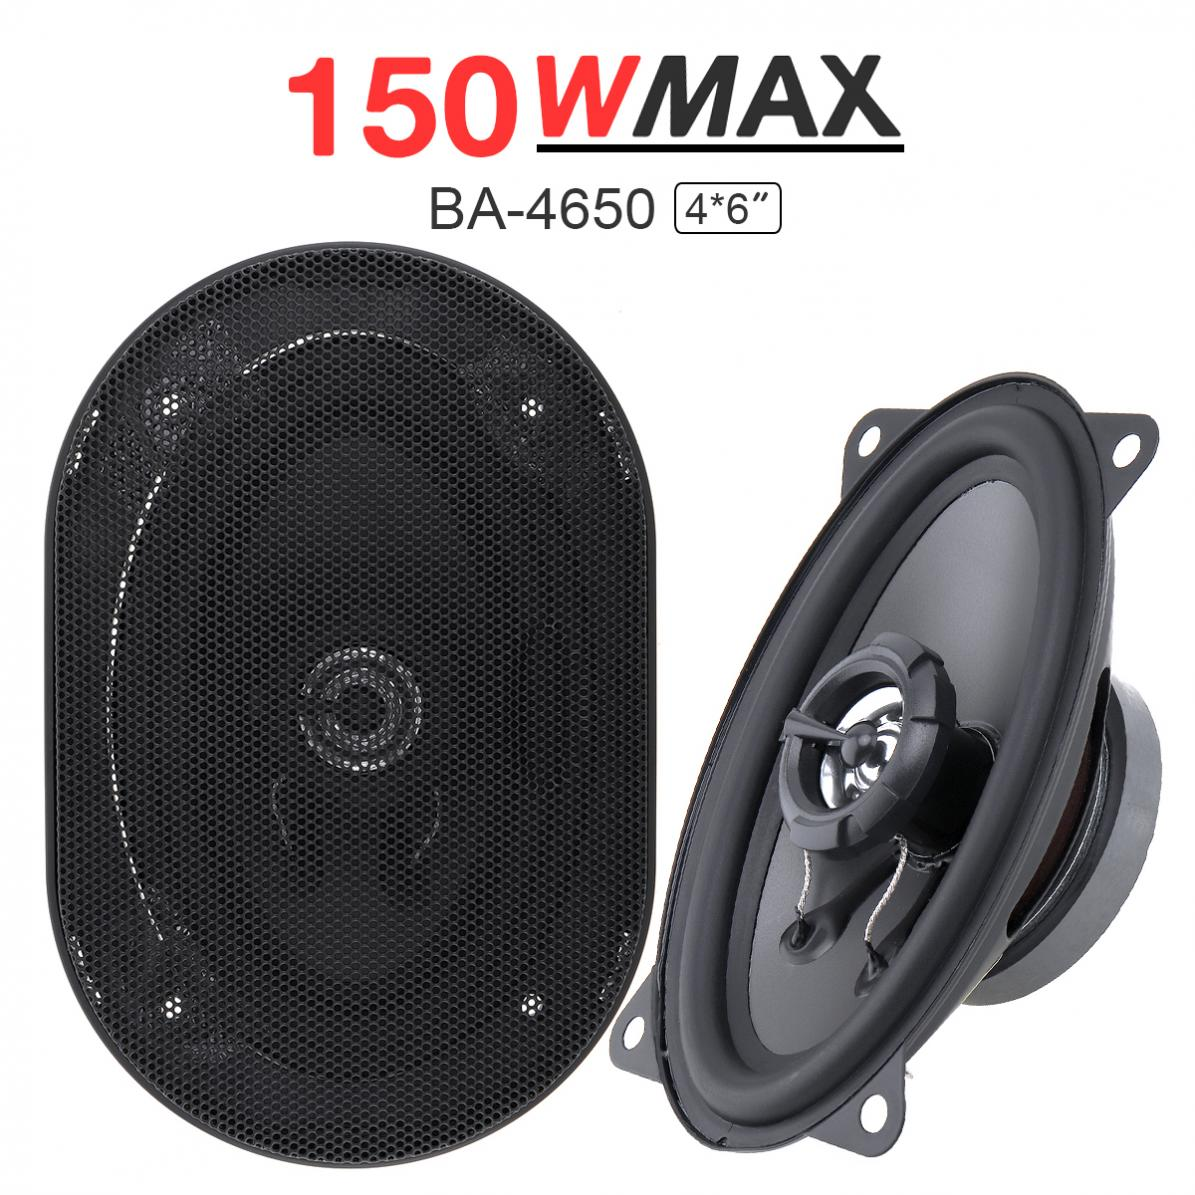 2 stücke 4X6 Inch 2 Weg 150 watt Auto Lautsprecher Automobil Auto HiFi Audio Full Palette Frequenz Koaxial lautsprecher Auto Hohe Pitch Lautsprecher